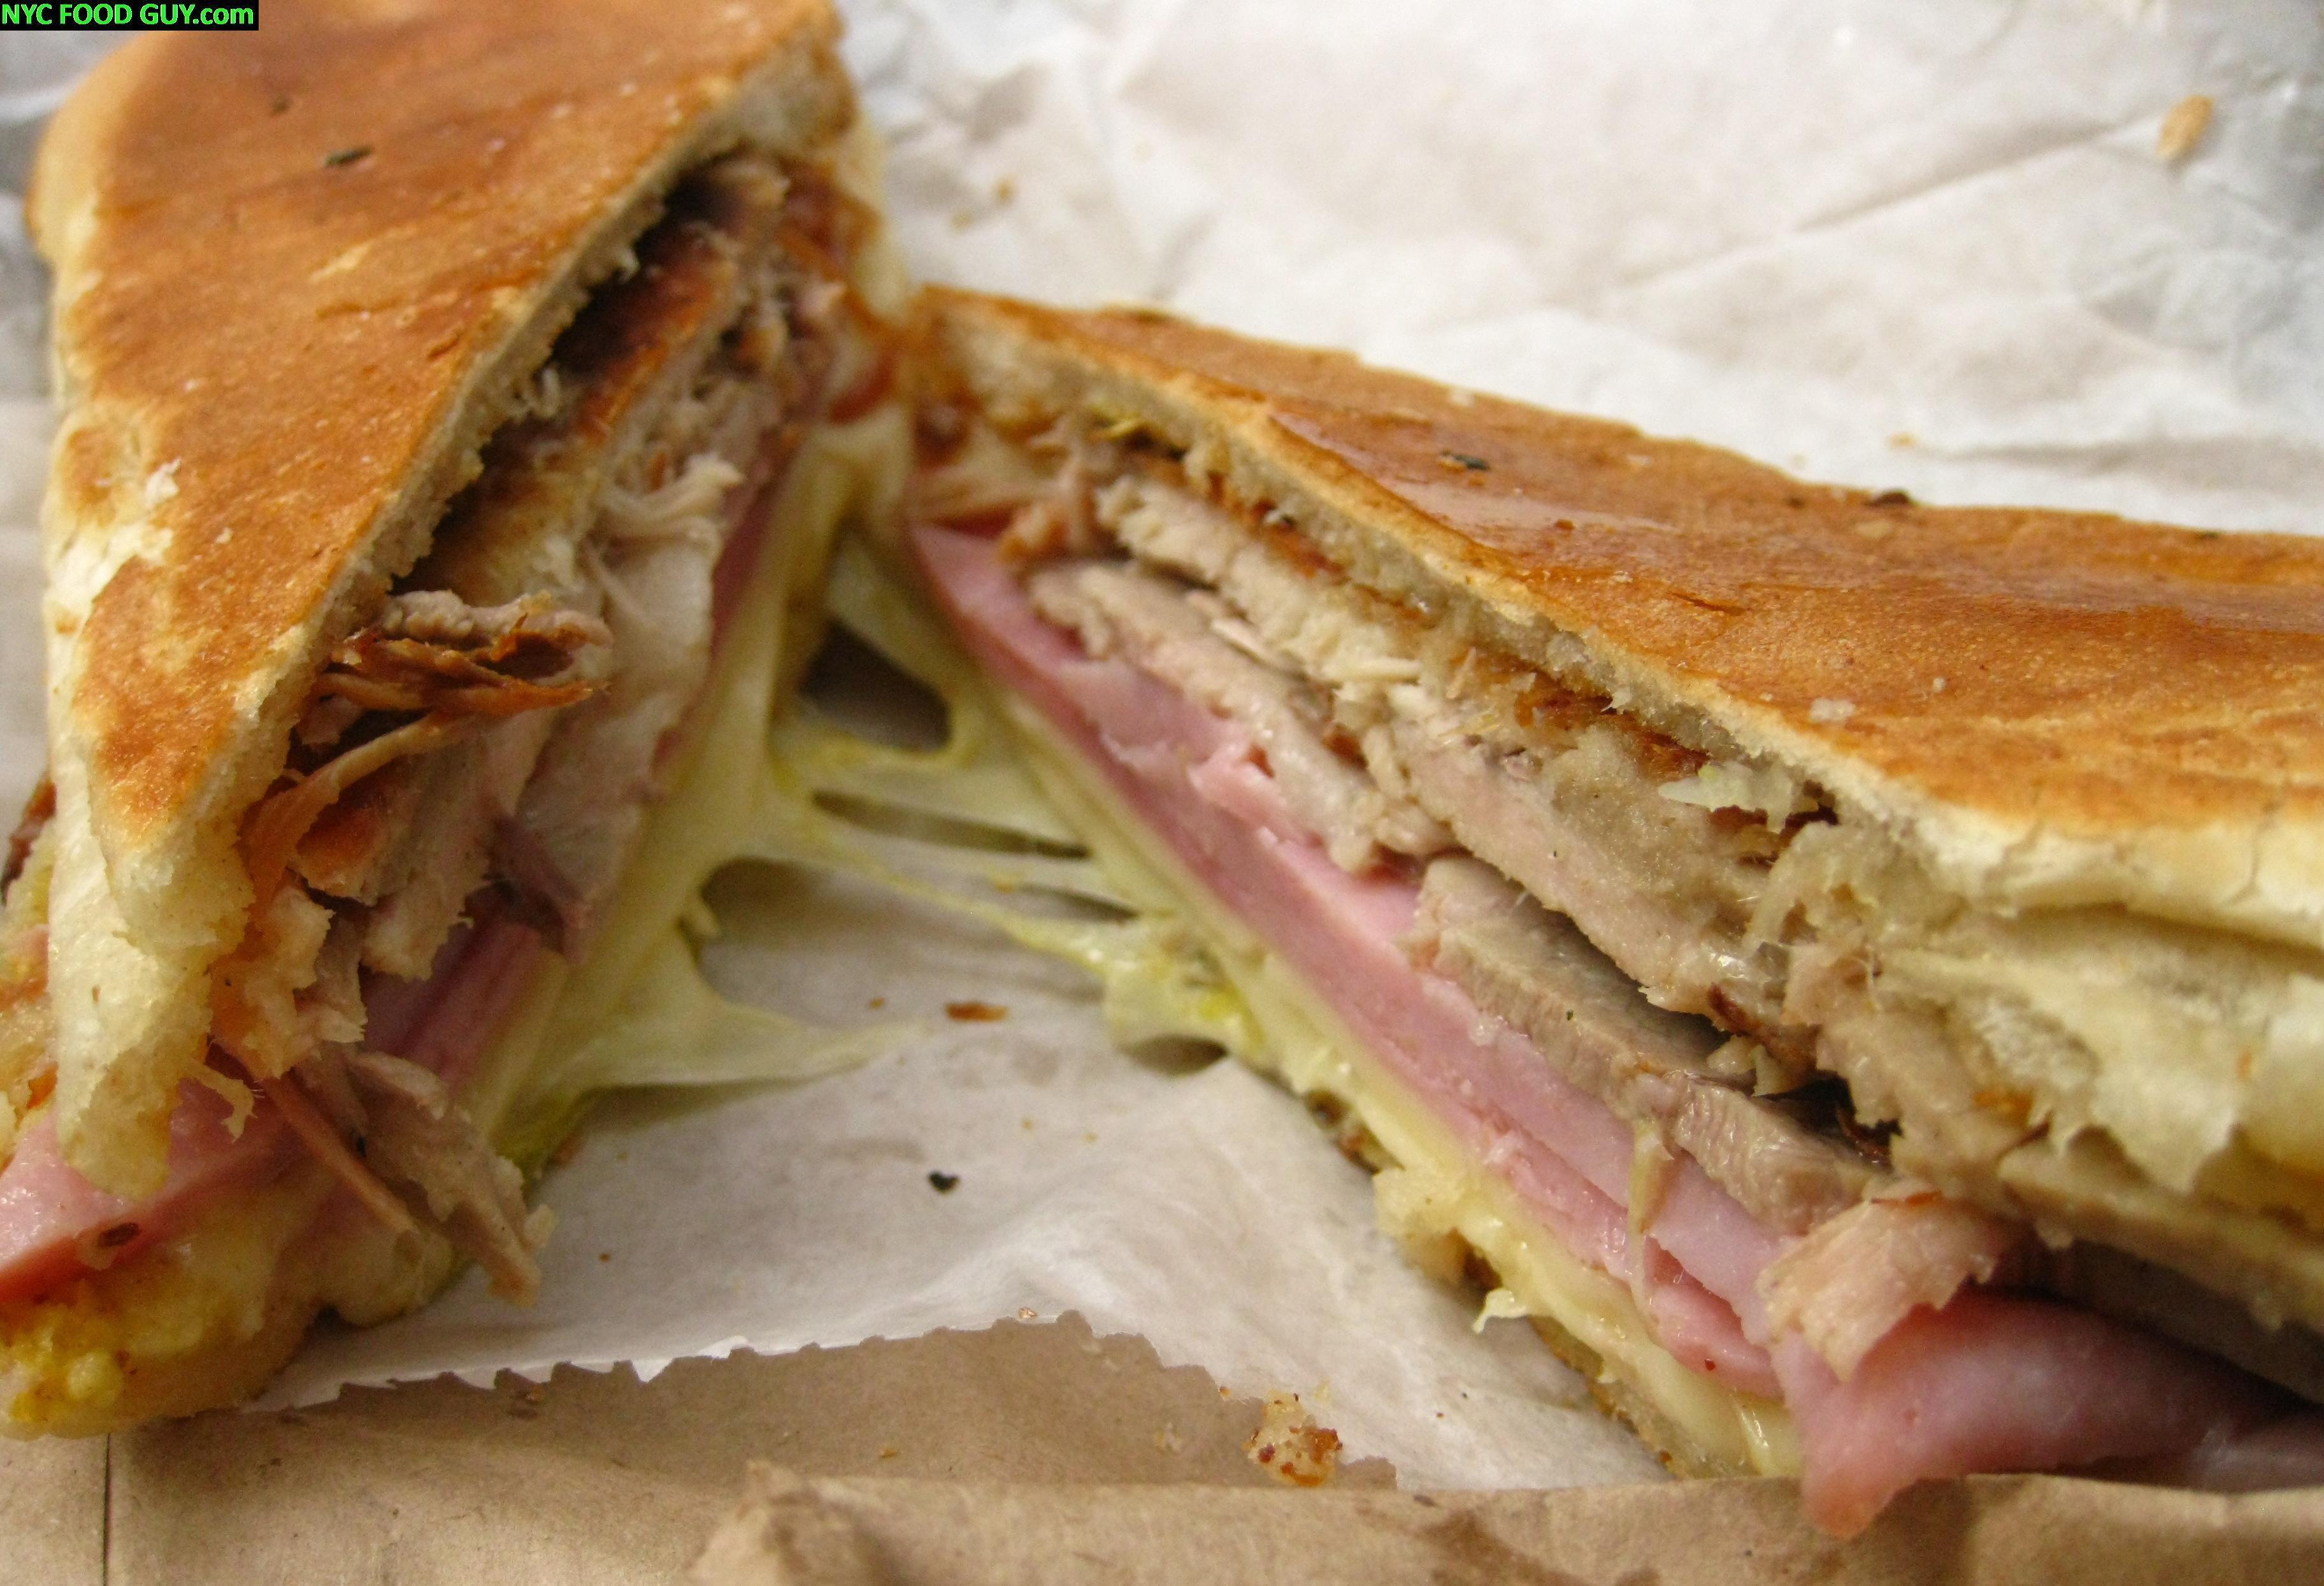 El Sitio Cuban Sandwich ($4.35). From Top to Bottom: Pressed Garlic-Butterd hero, roast pork, sliced ham, melted Swiss, pickles, mustard